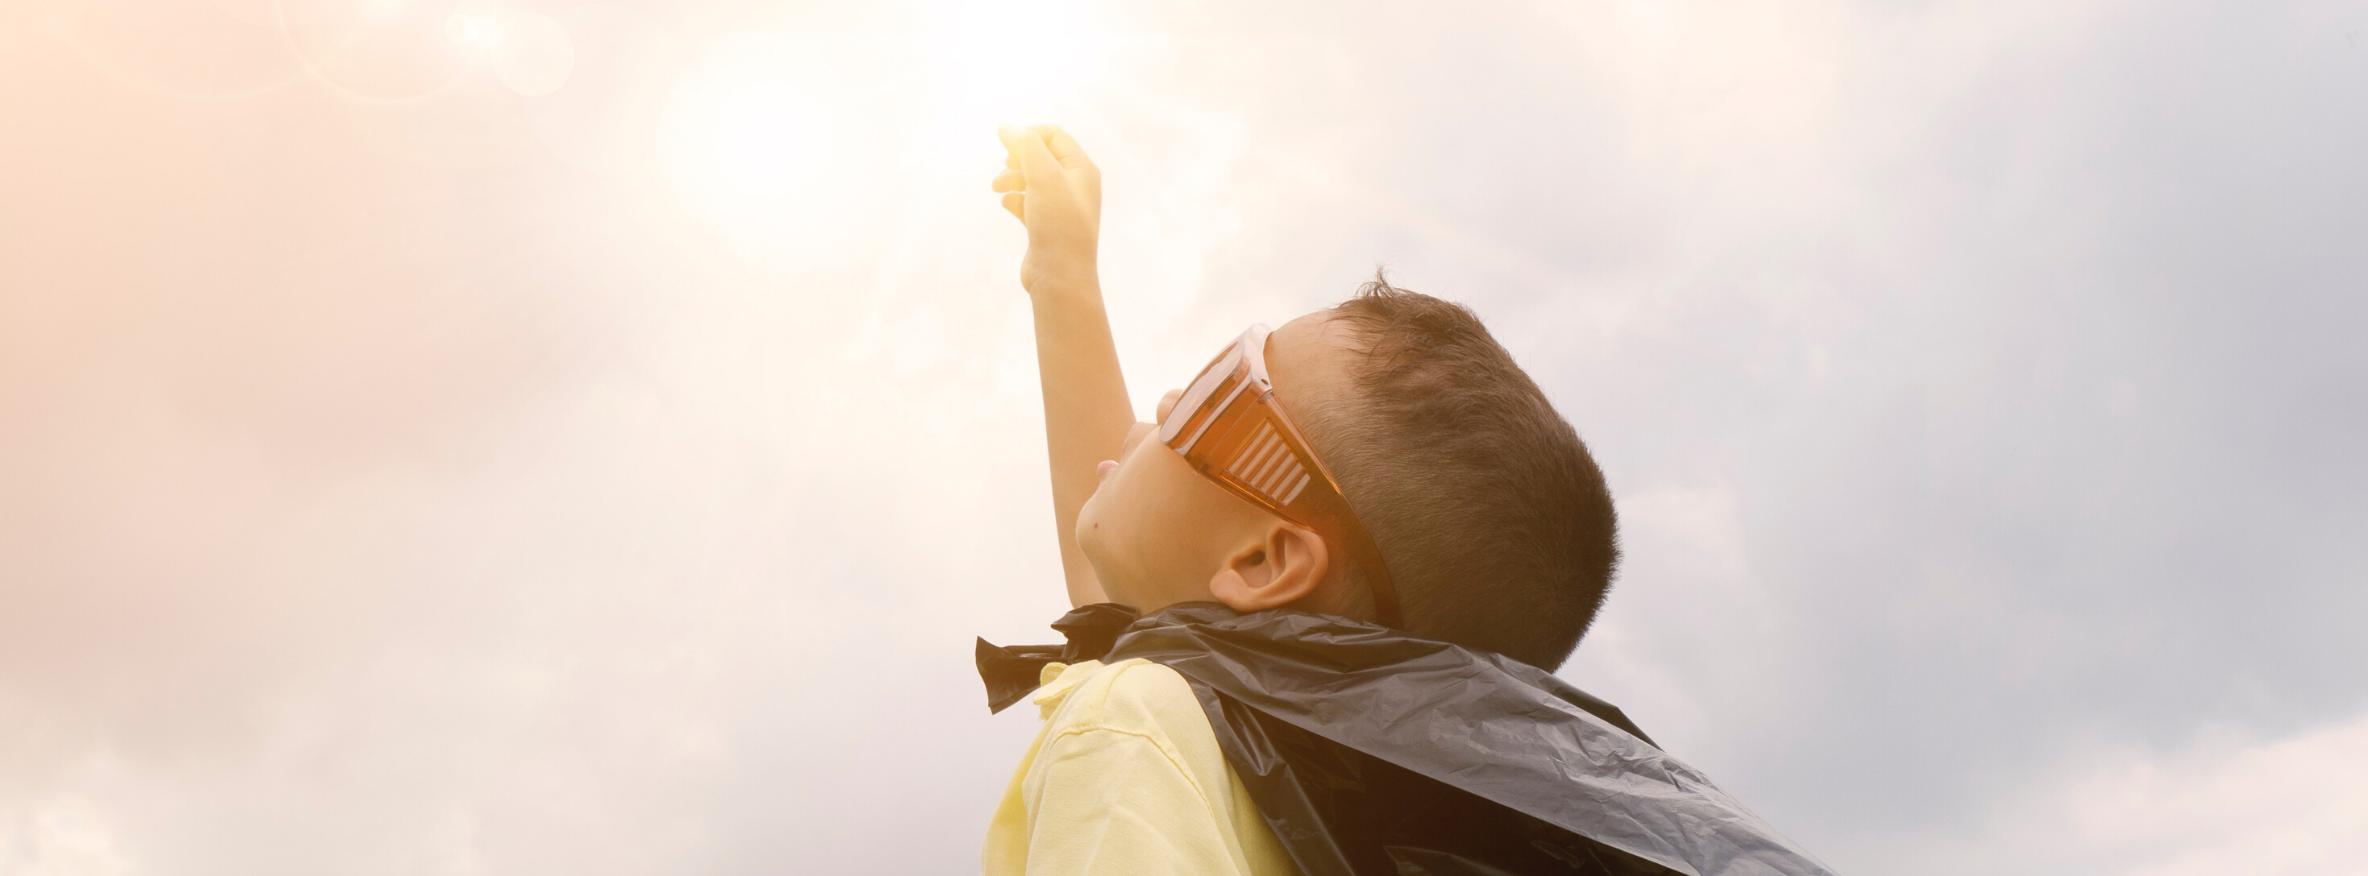 2019-boy-hero-clouds-kid-Photo: Porapak Apichodilok/Pexels